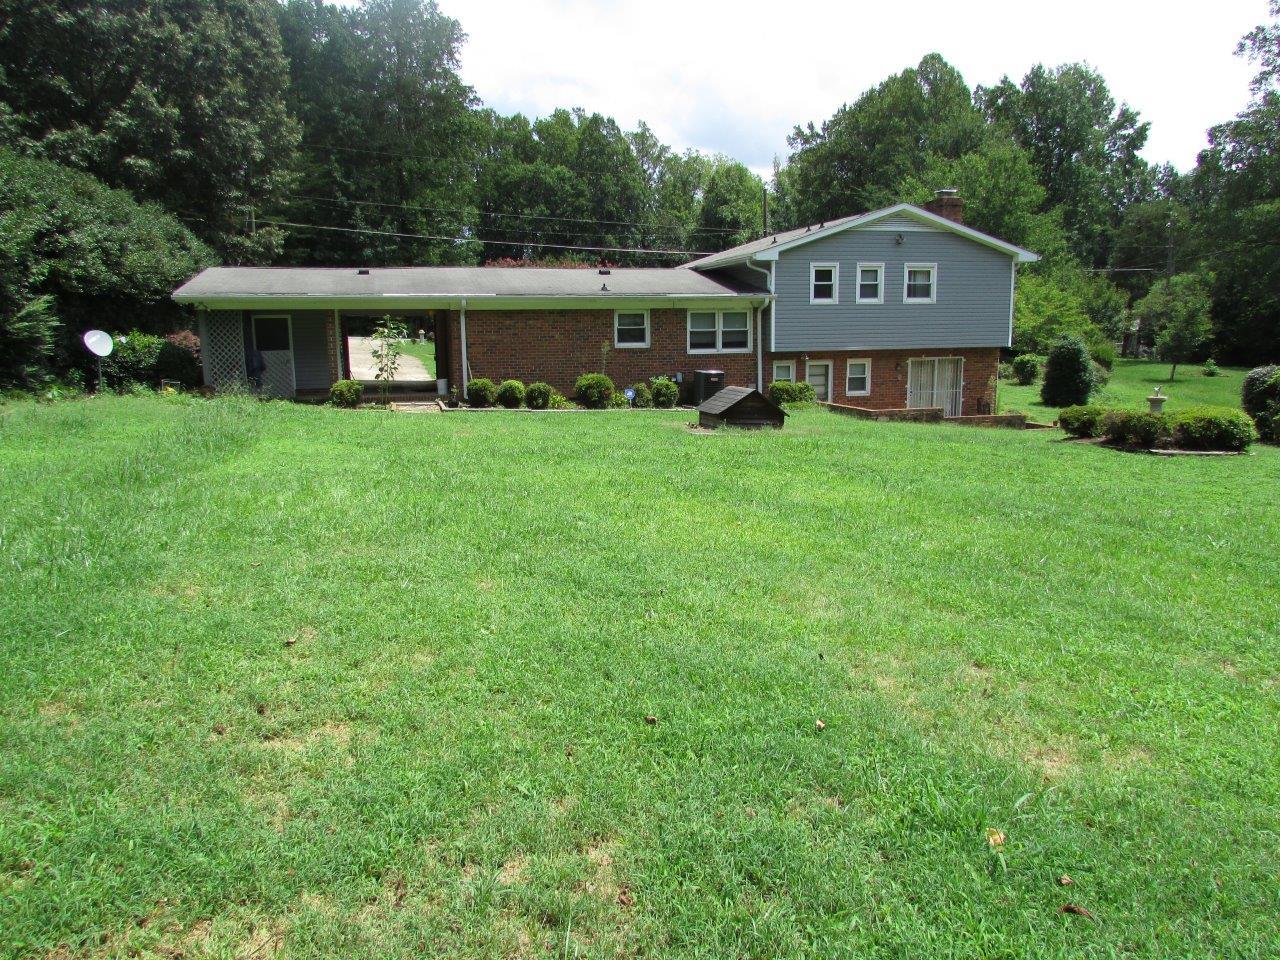 Photo of 1618 Brannock Dr, Greensboro, NC, 27406